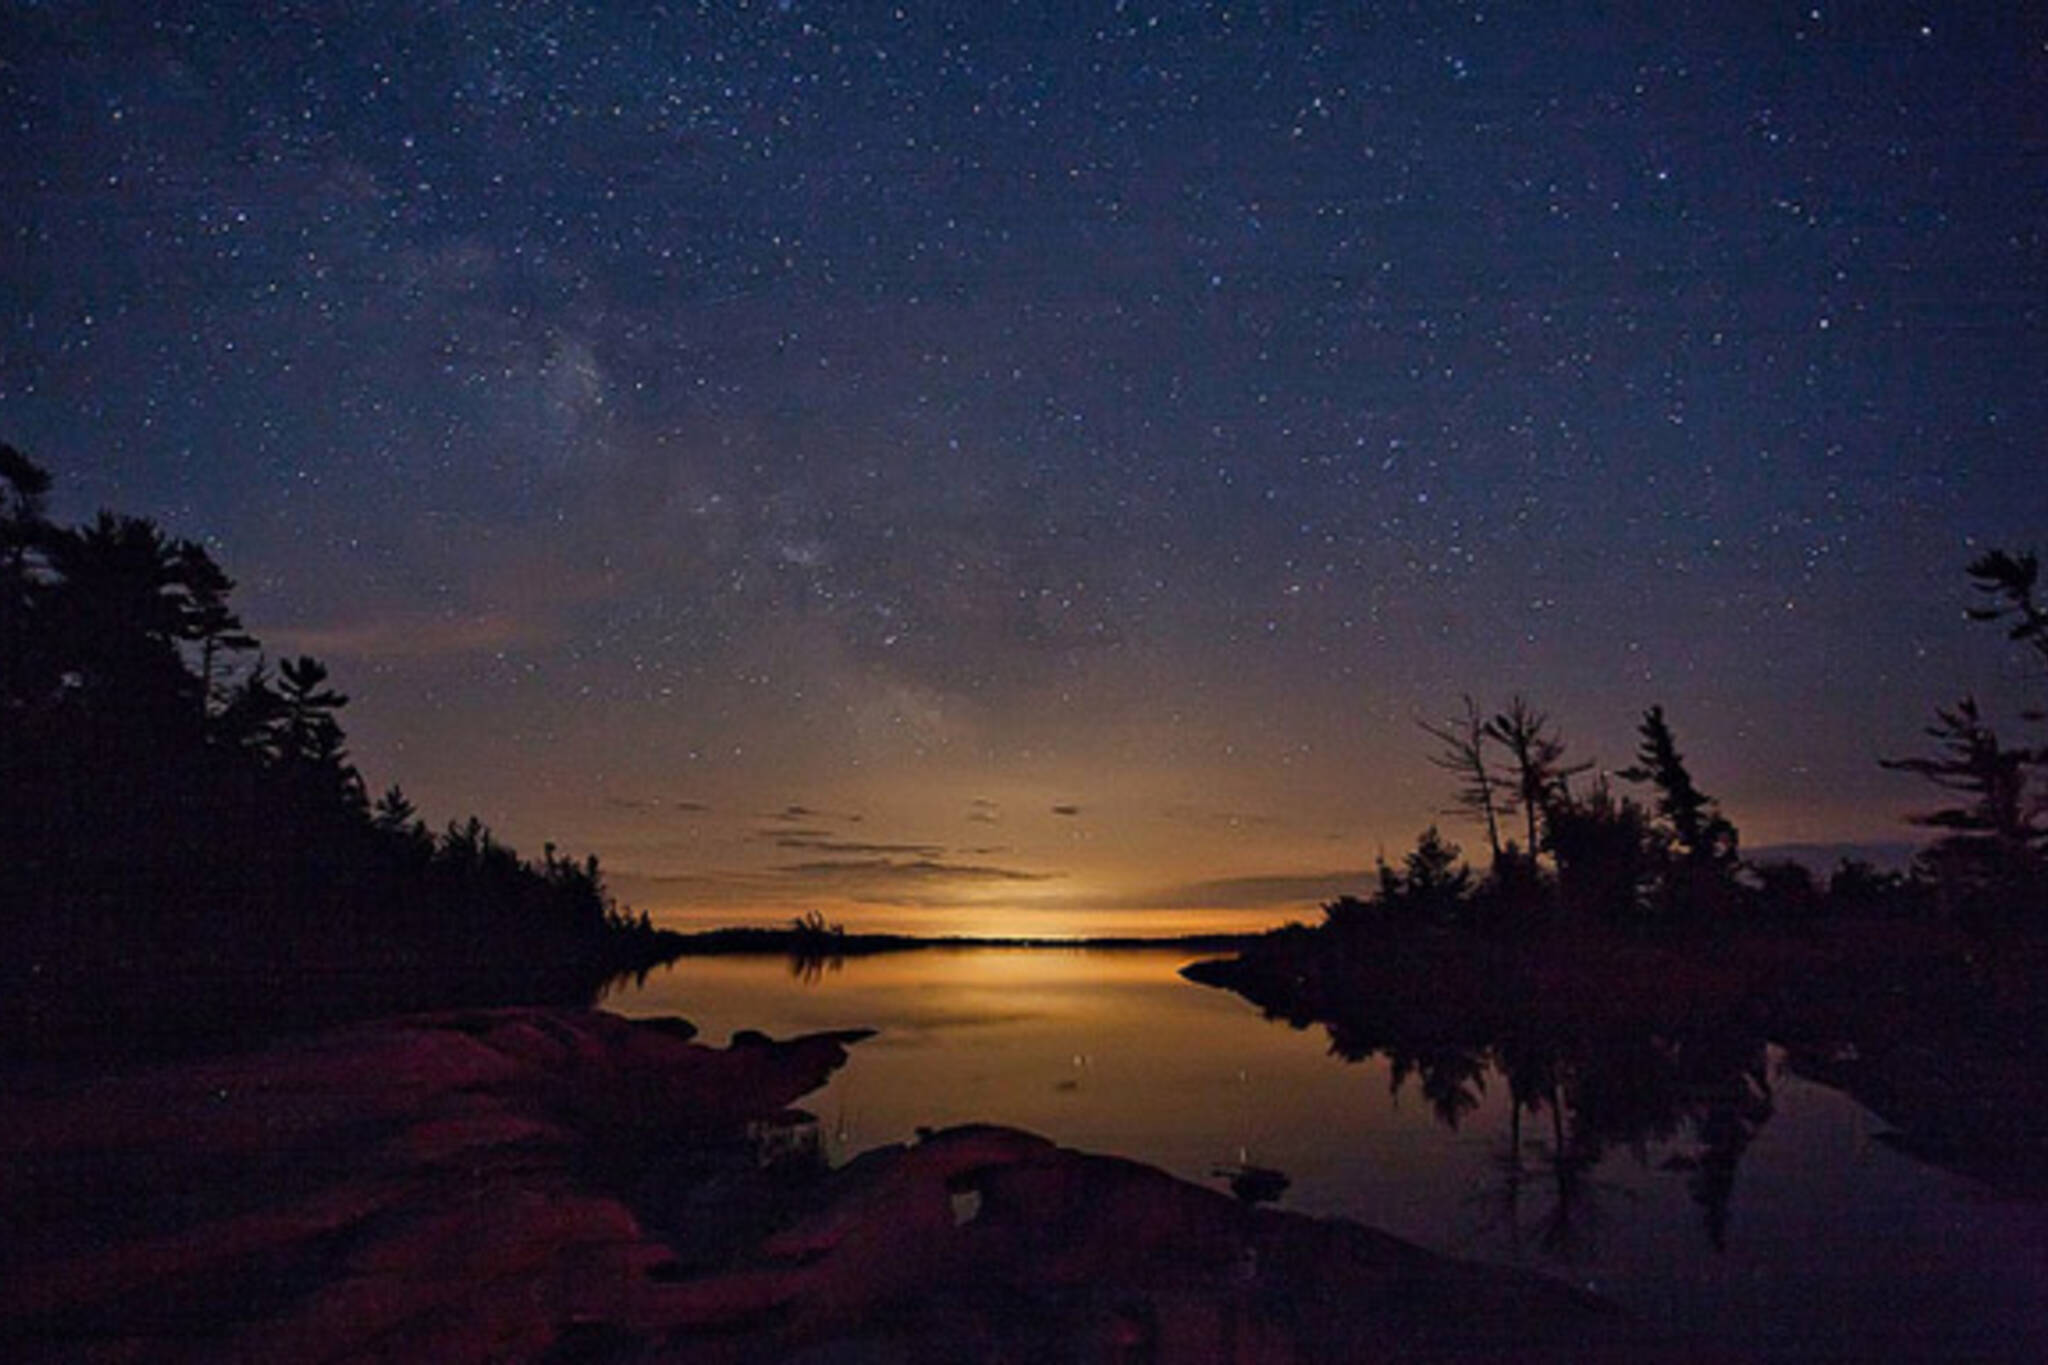 park, stars, night